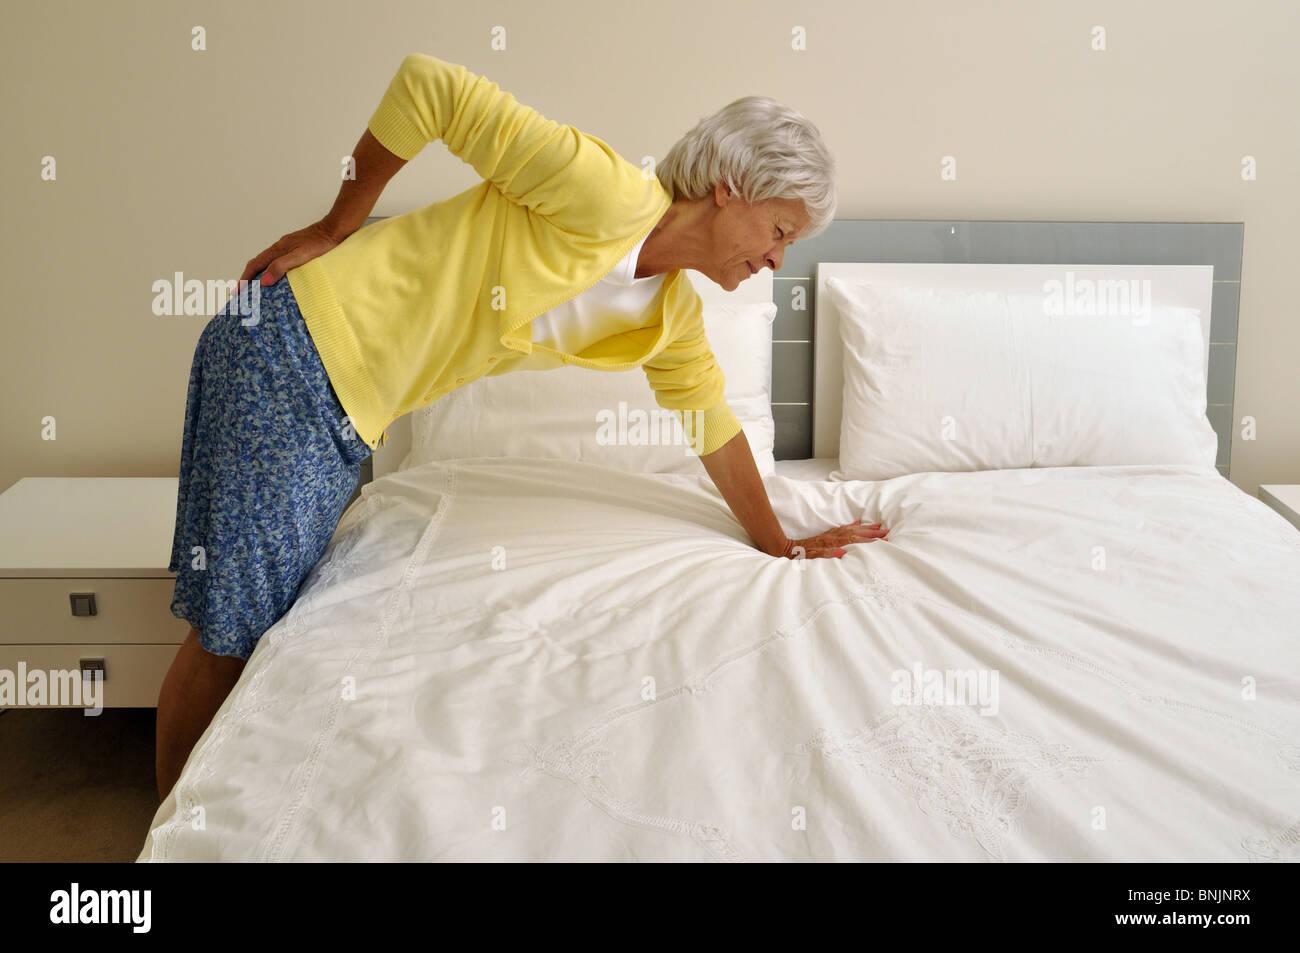 back pain pensioner senior old woman mature lumbago hurt pain bedroom stock photo royalty free. Black Bedroom Furniture Sets. Home Design Ideas